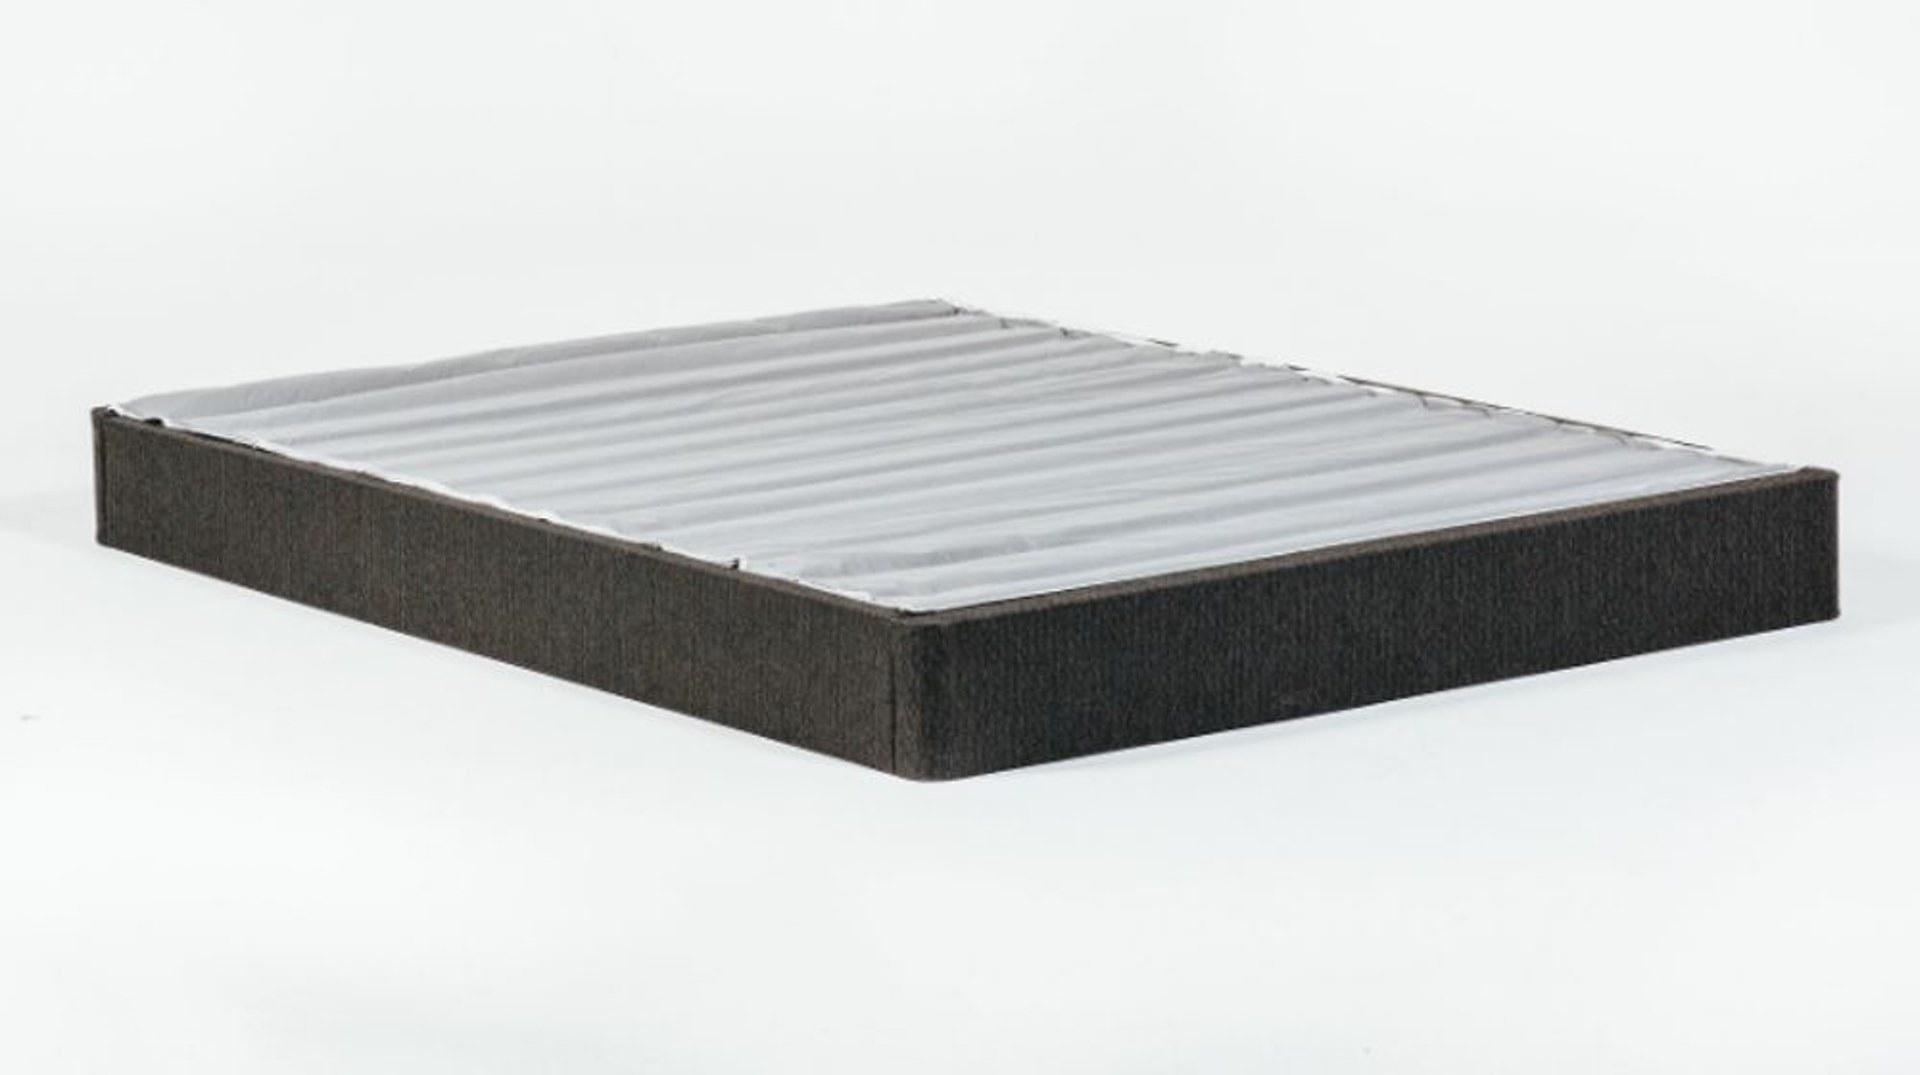 Idle Sleep mattress foundation fully assembled